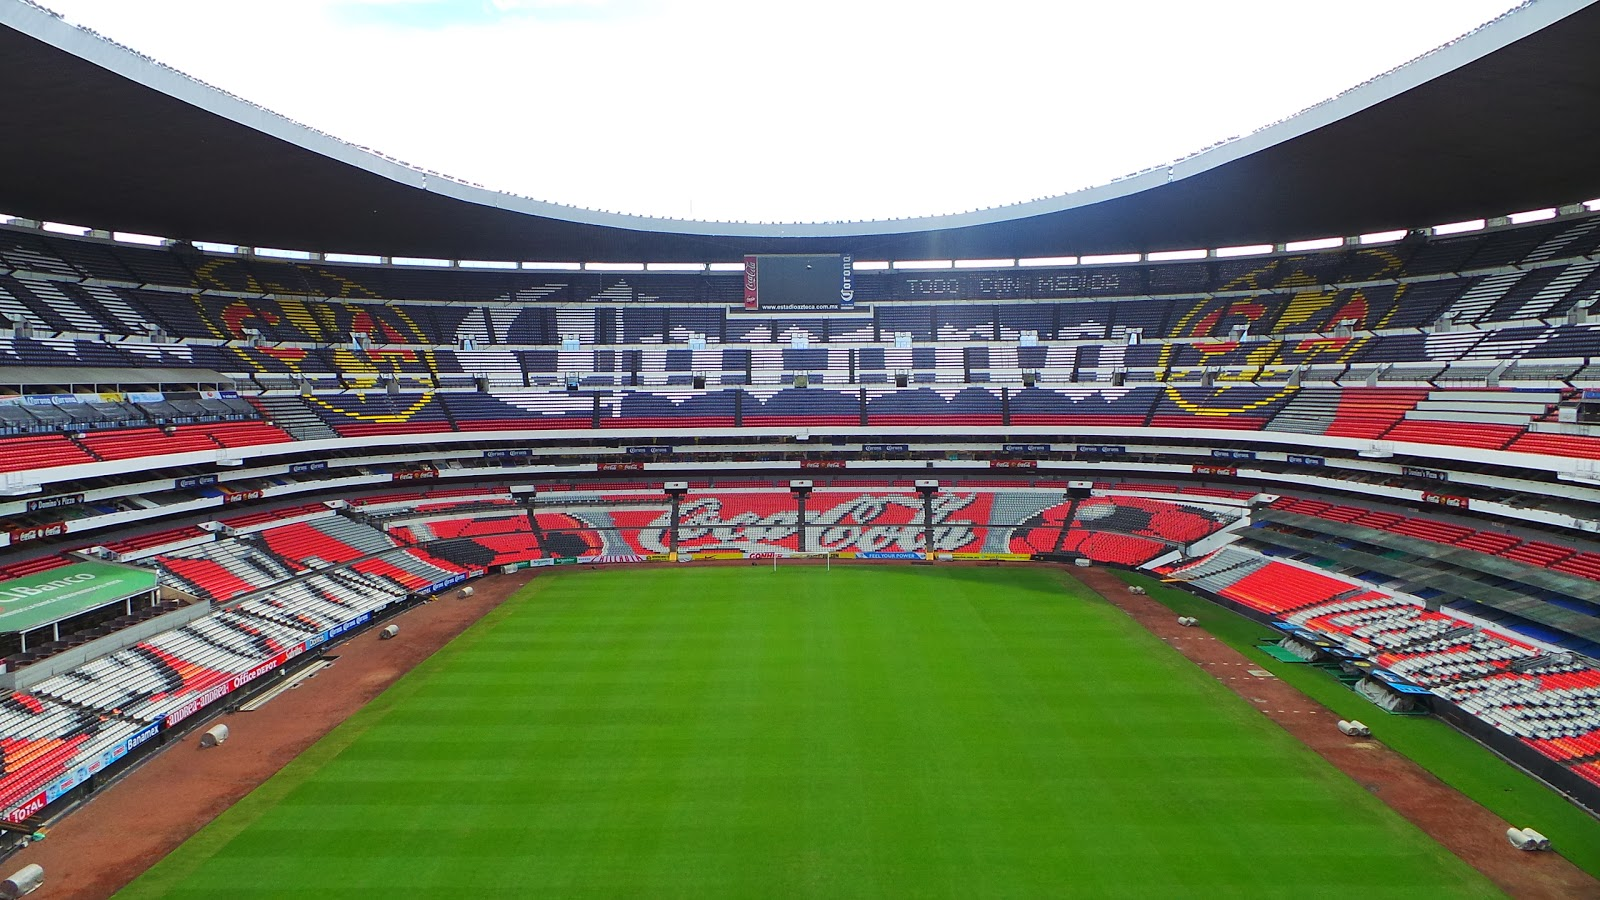 Cruz Azul Wallpaper Hd Lucalovesfootball Estadio Azteca